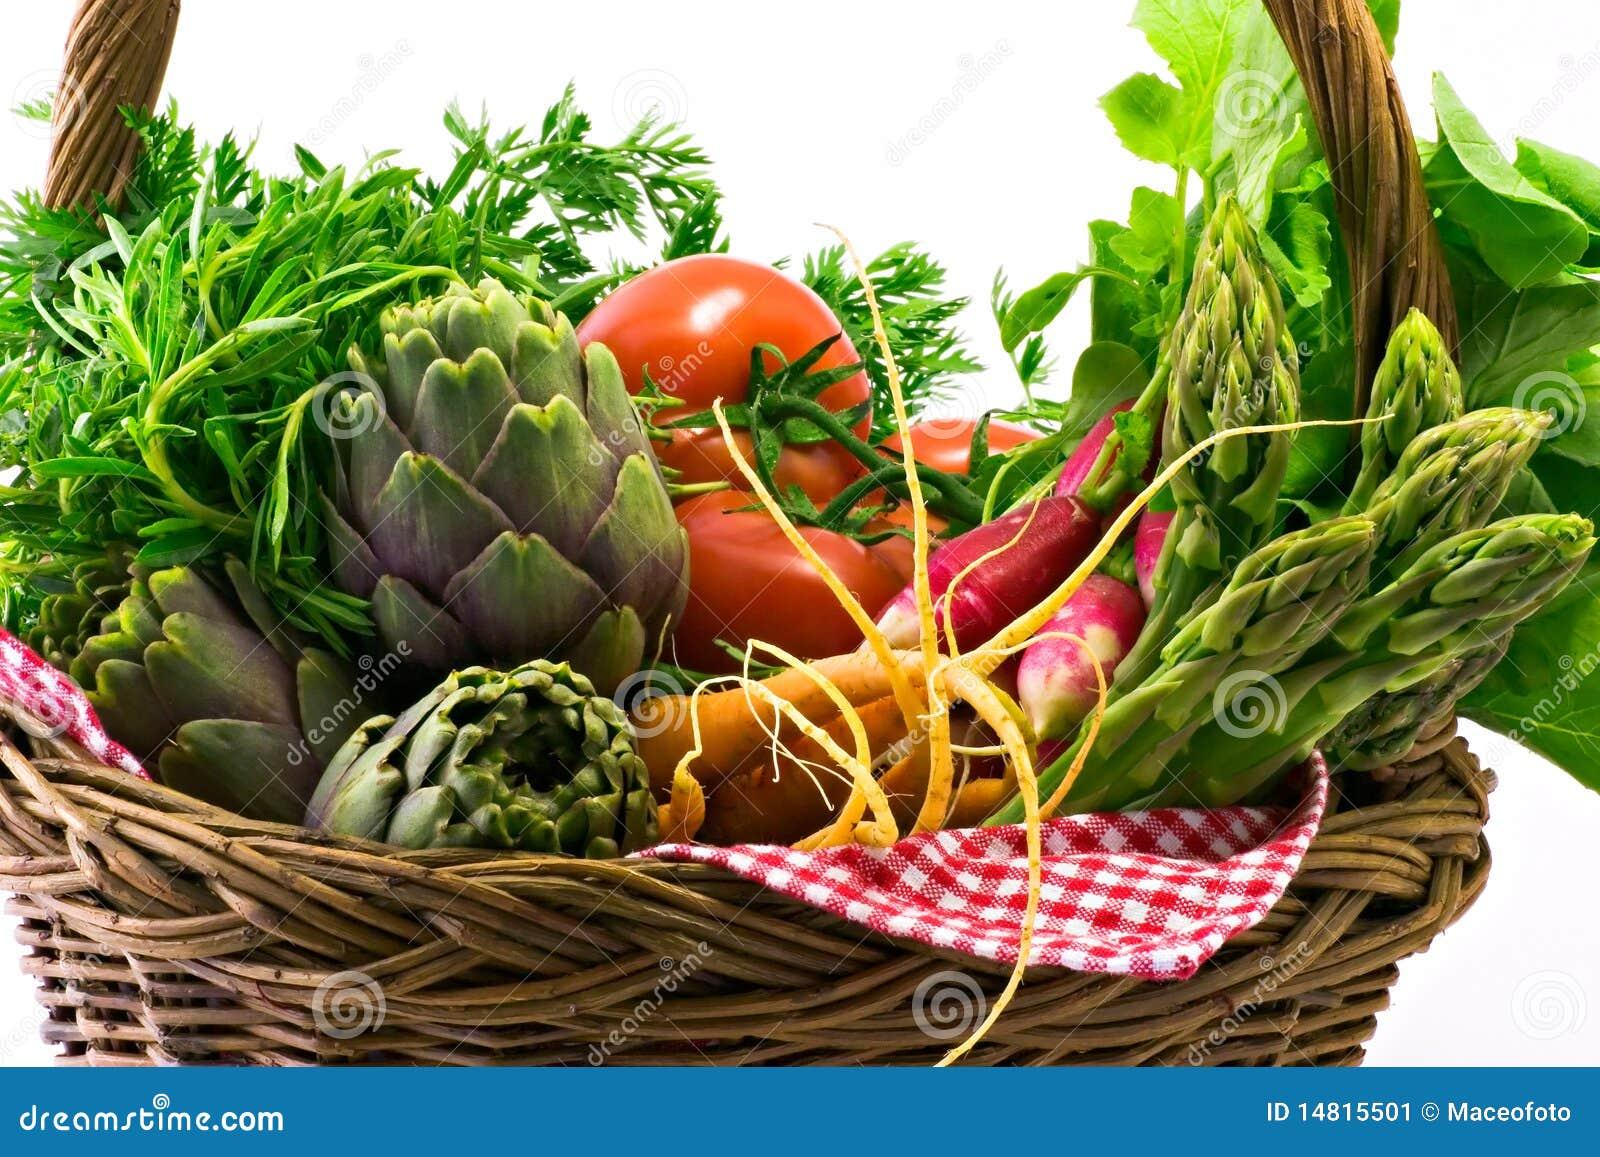 Panier végétal